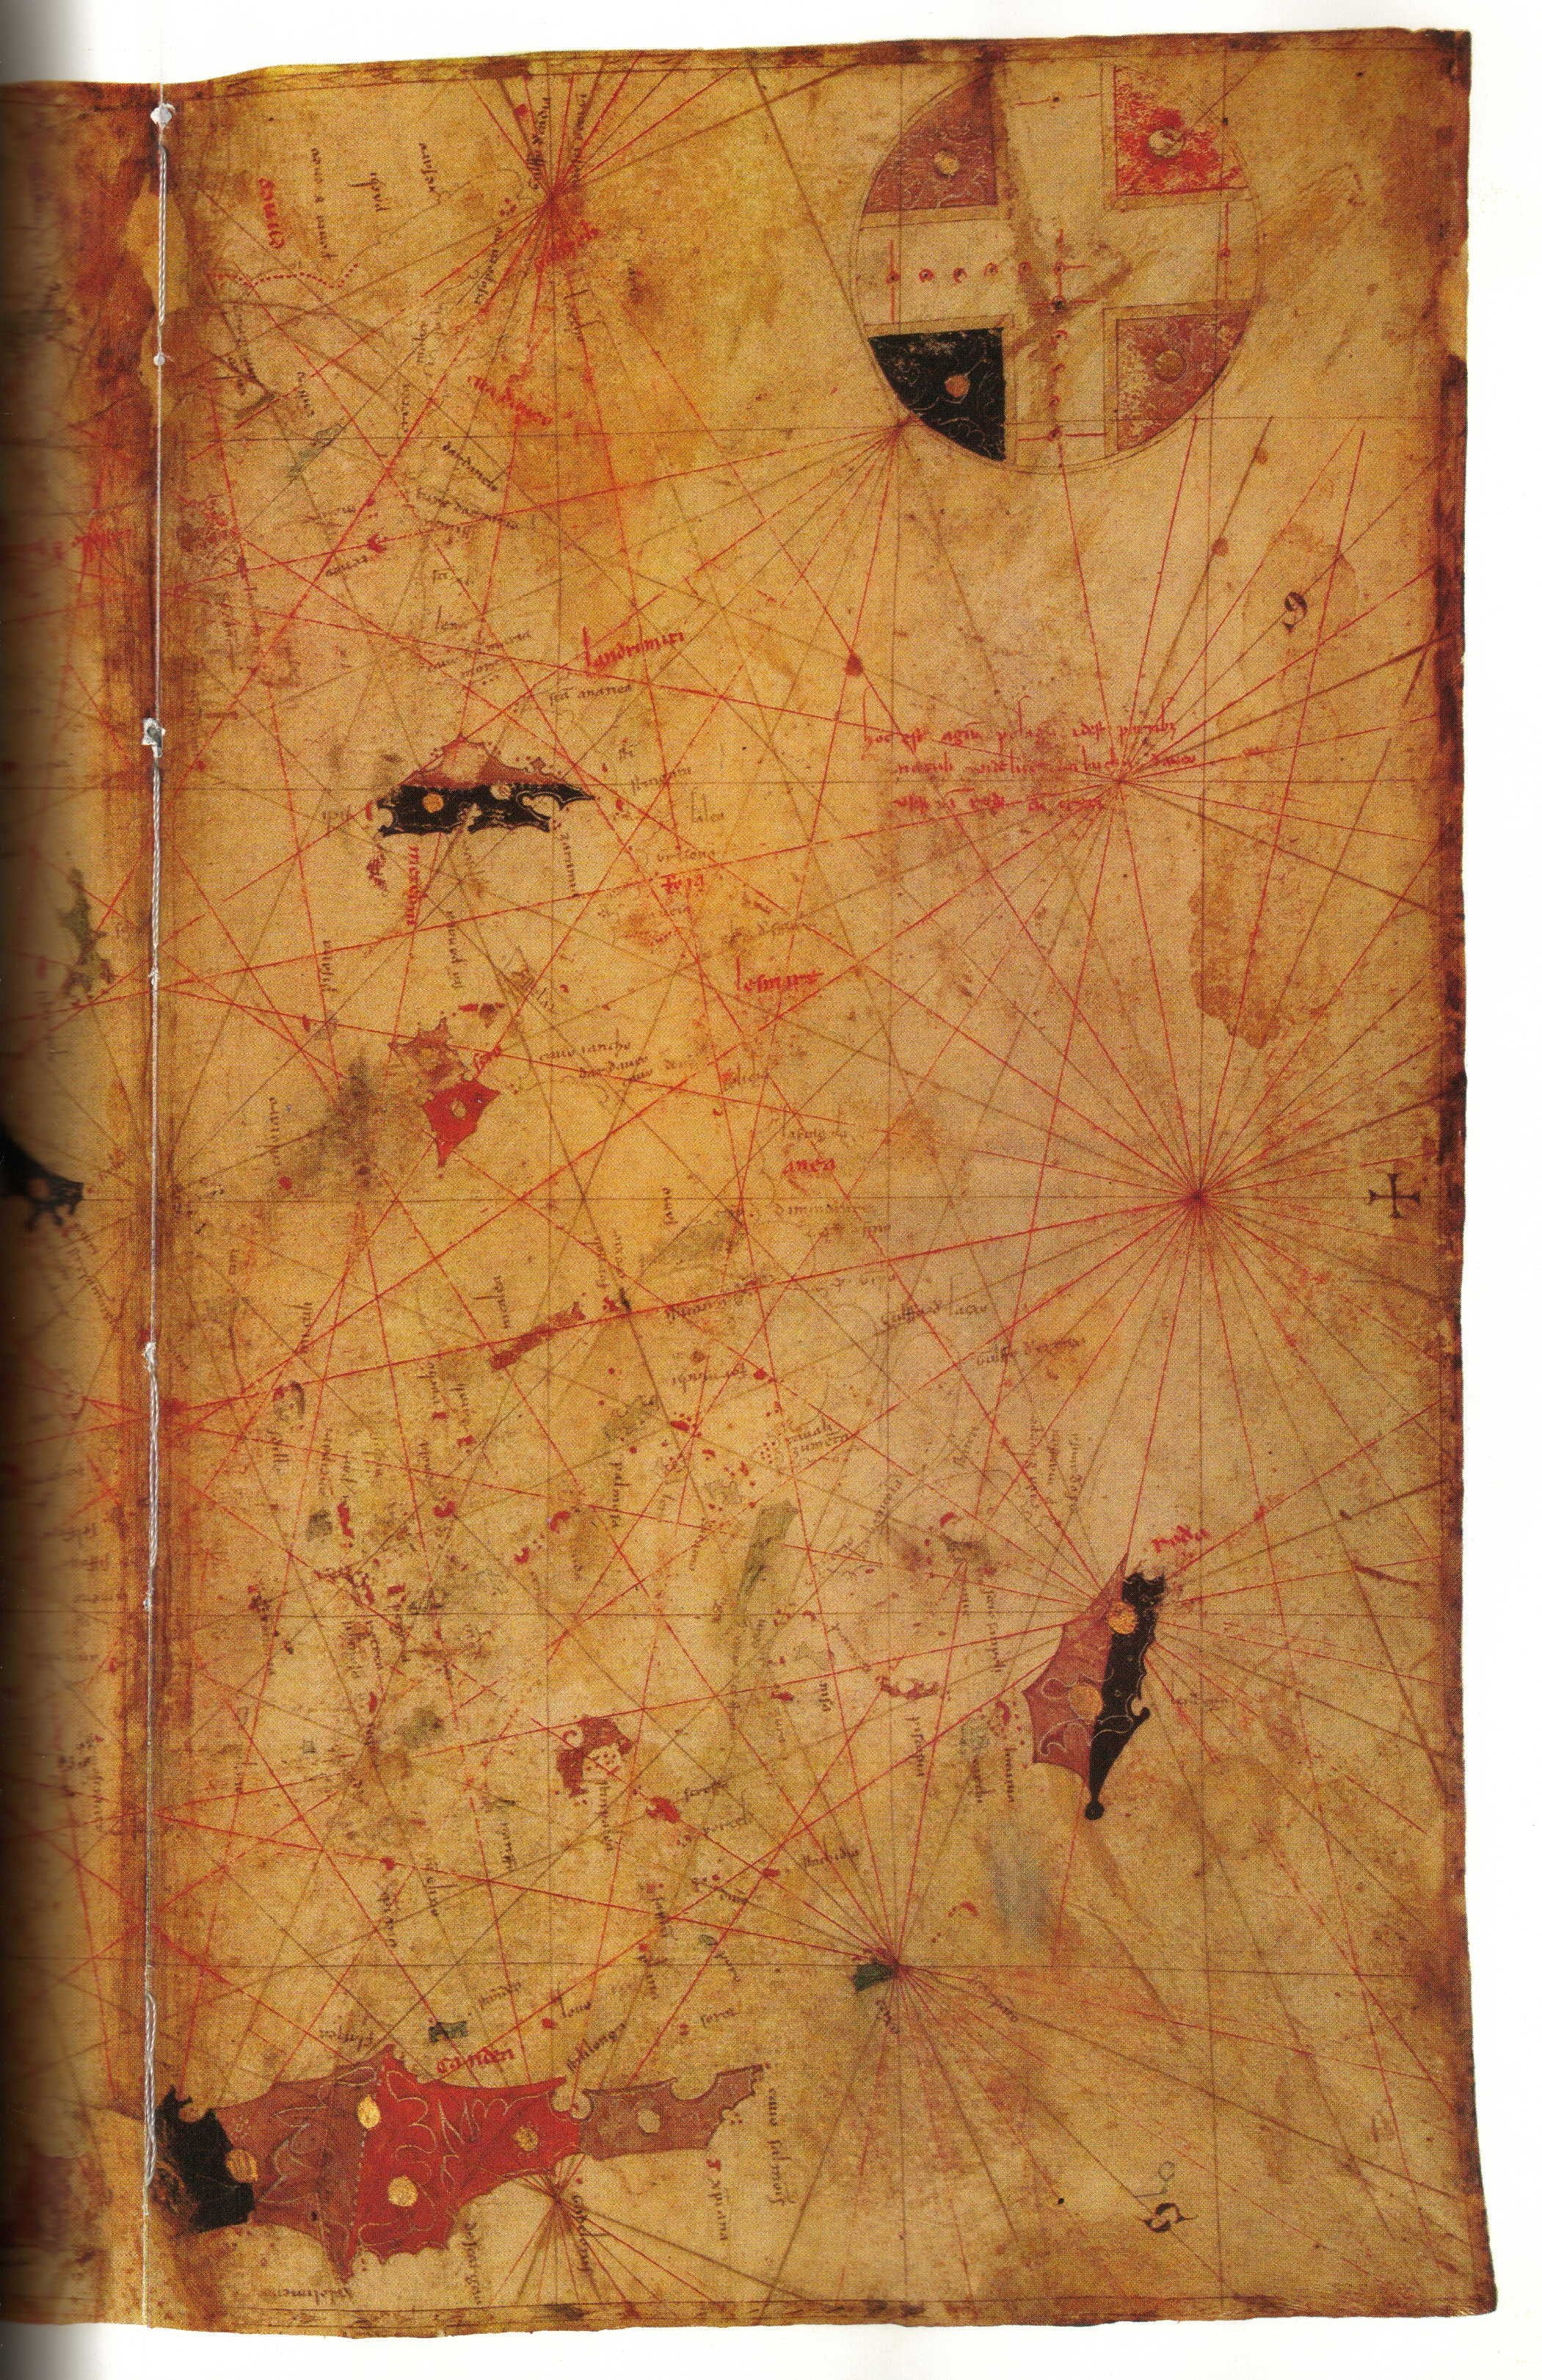 CARTA di PIETRO VESCONTE. Carta nautica del Mediterraneo, 1313, Parigi, B. N., rés. Ge DD 687. (Kish 1980, tav. 42)